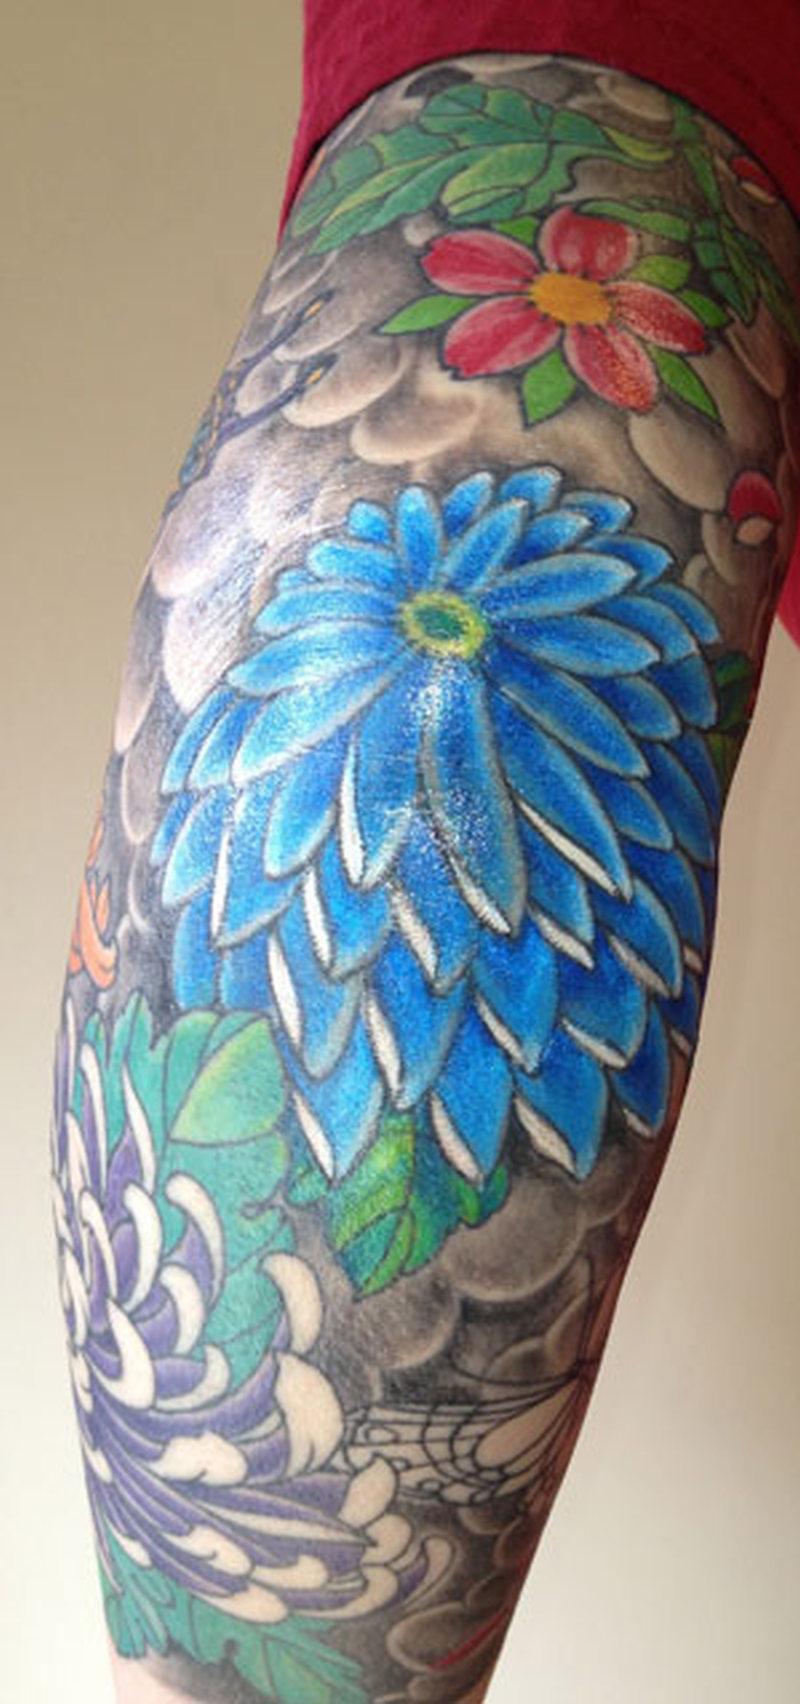 Chrysanthemum tattoo on bent elbow